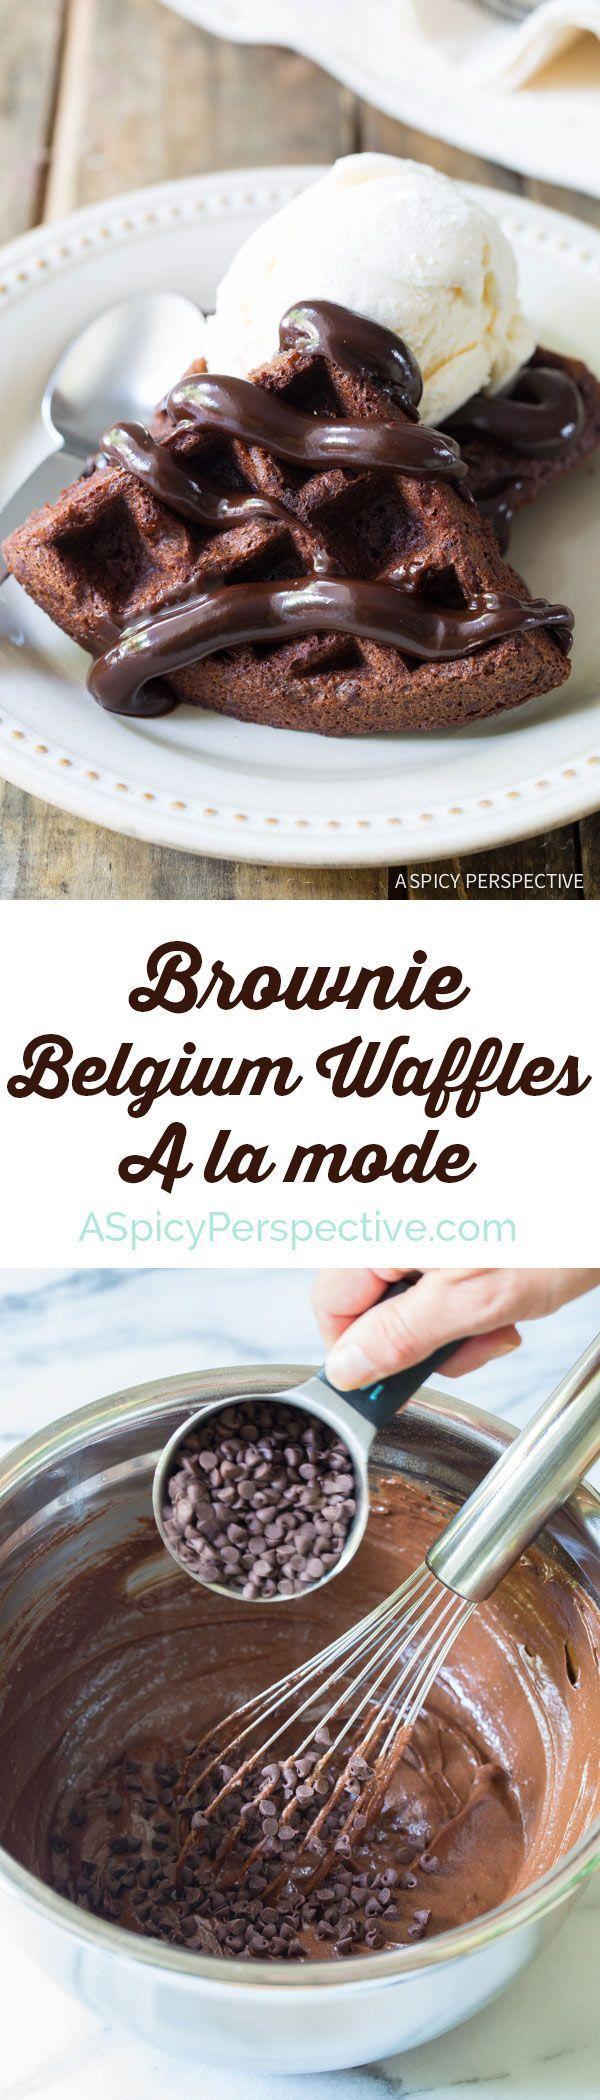 Brownie Belgium Waffles A La Mode | Health Lala